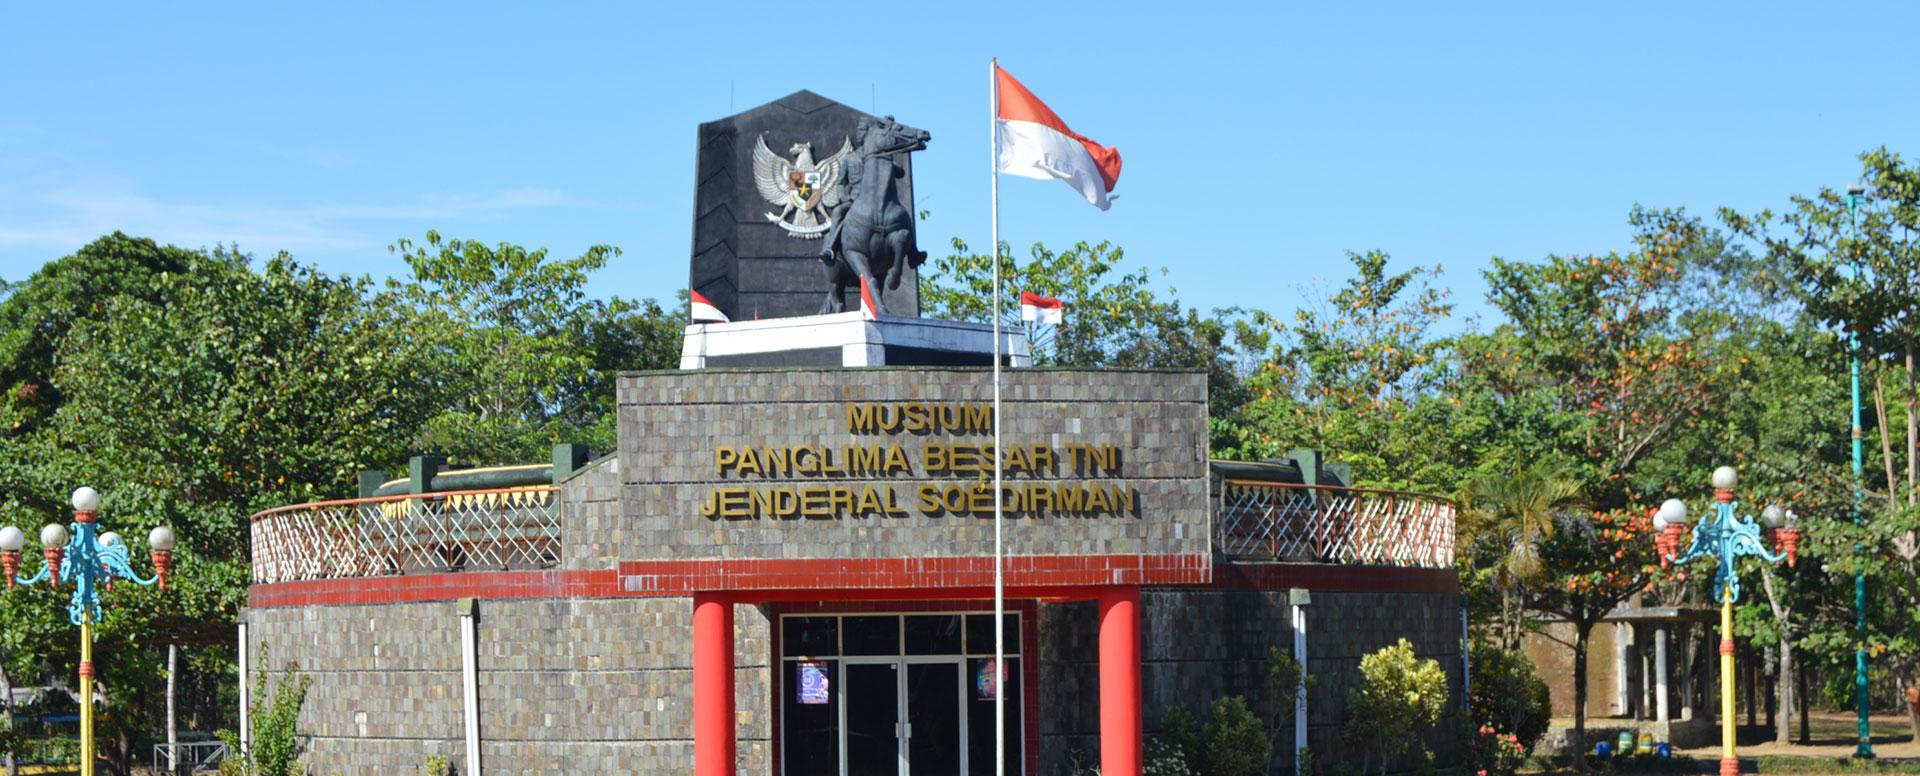 Destinasi Wisata Banyumas Museum Panglima Besar Jenderal Soedirman Jendral Sudirman